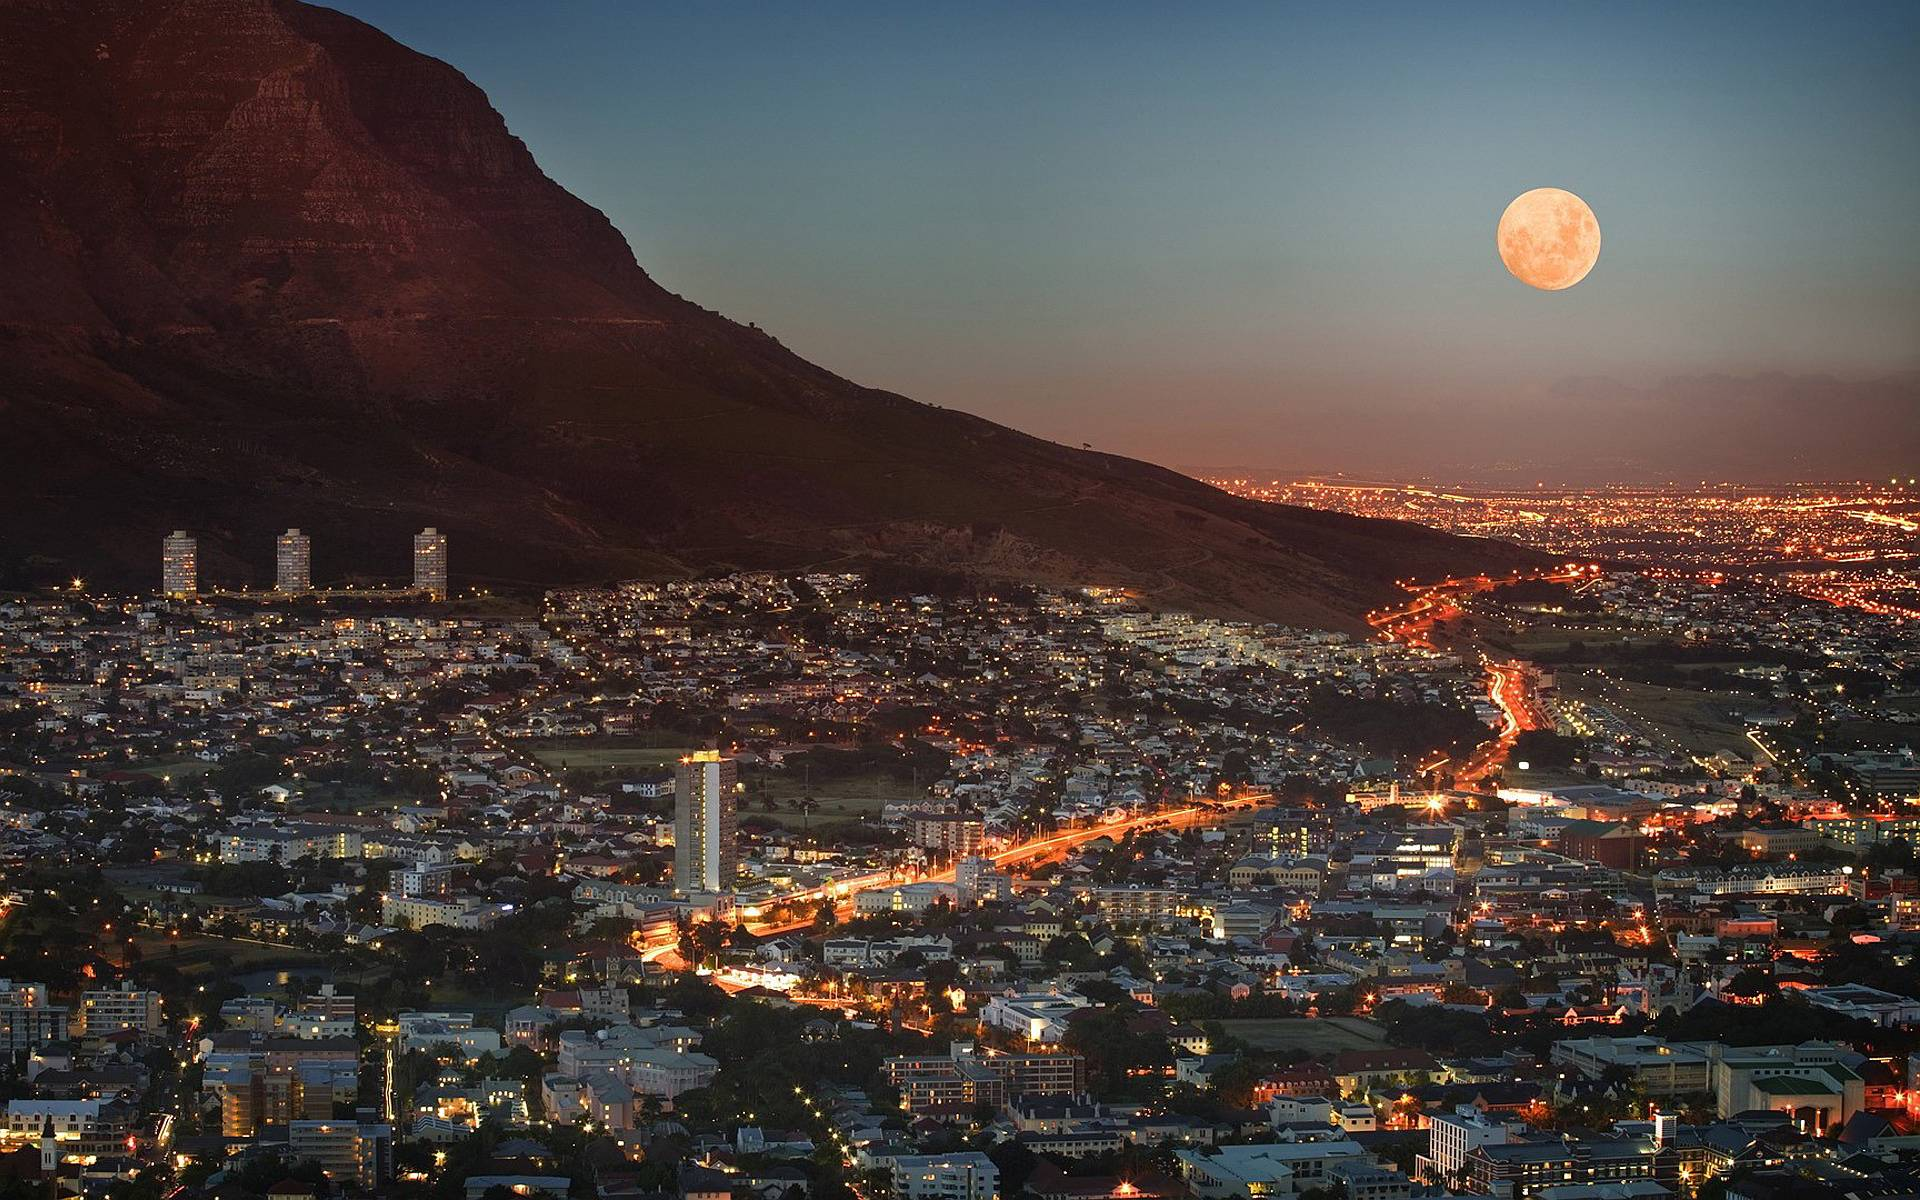 Ciudad del Cabo sudafrica noche